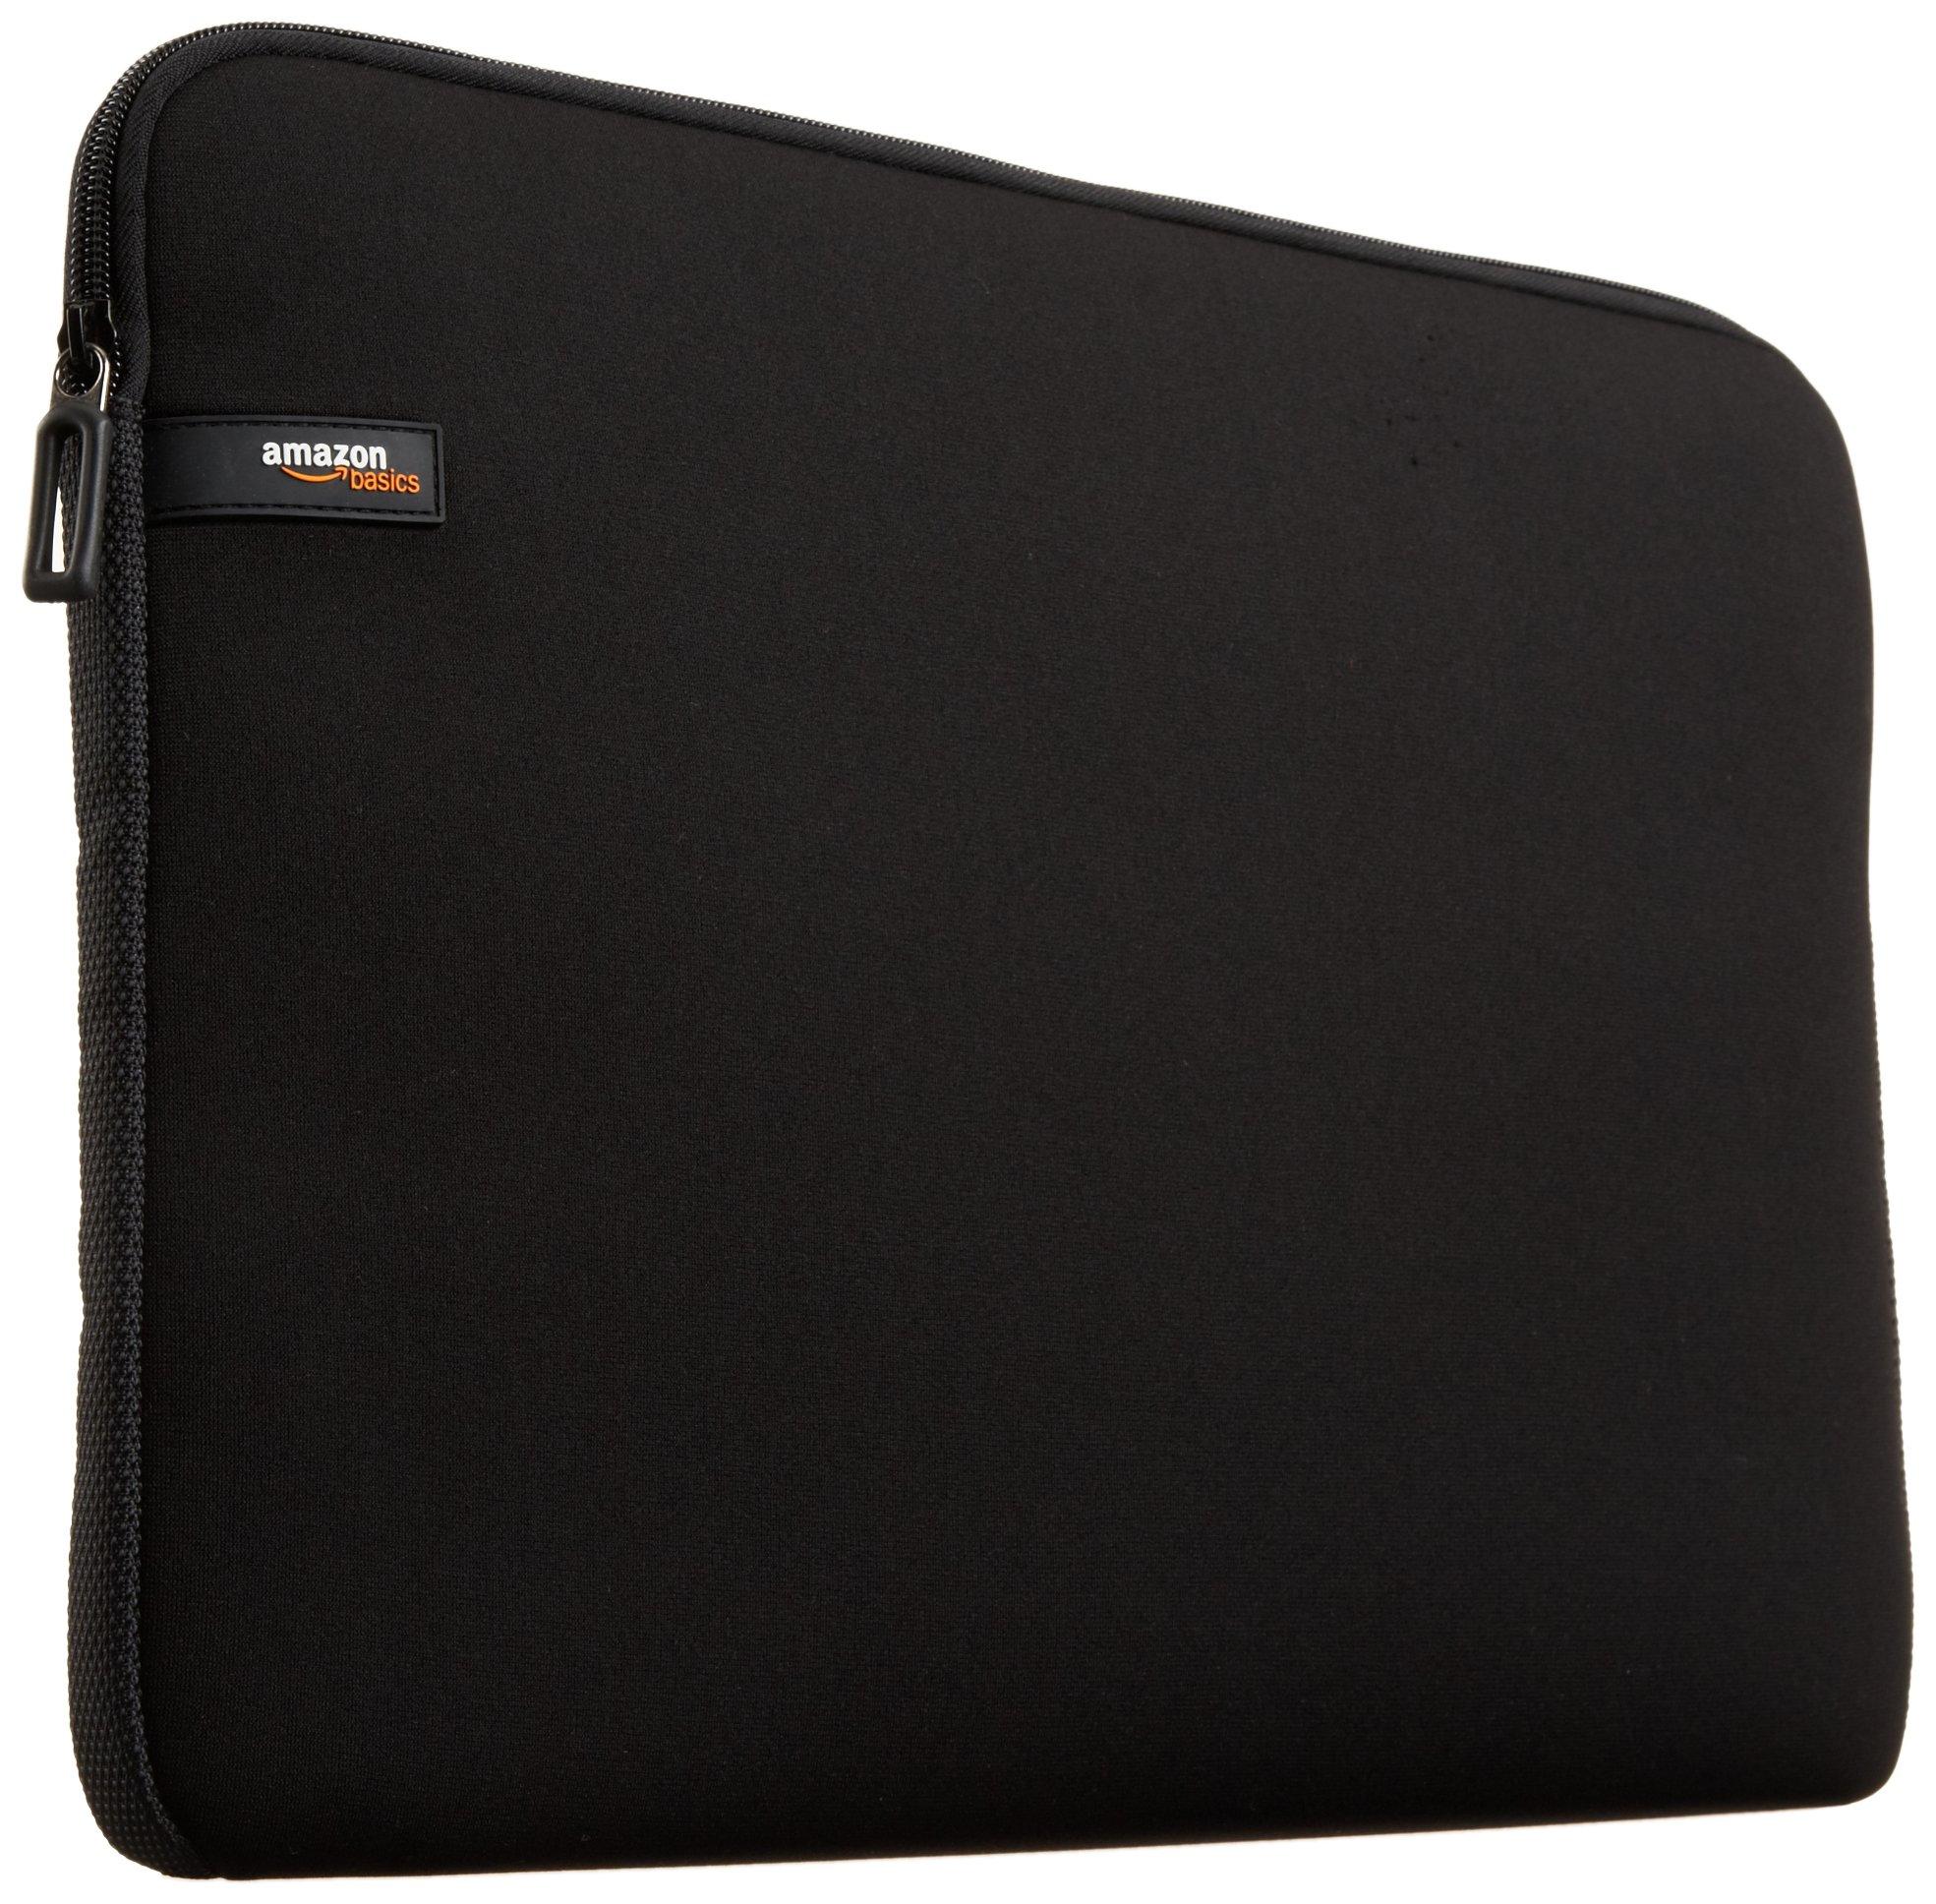 AmazonBasics 13.3-Inch Laptop Sleeve - Black by AmazonBasics